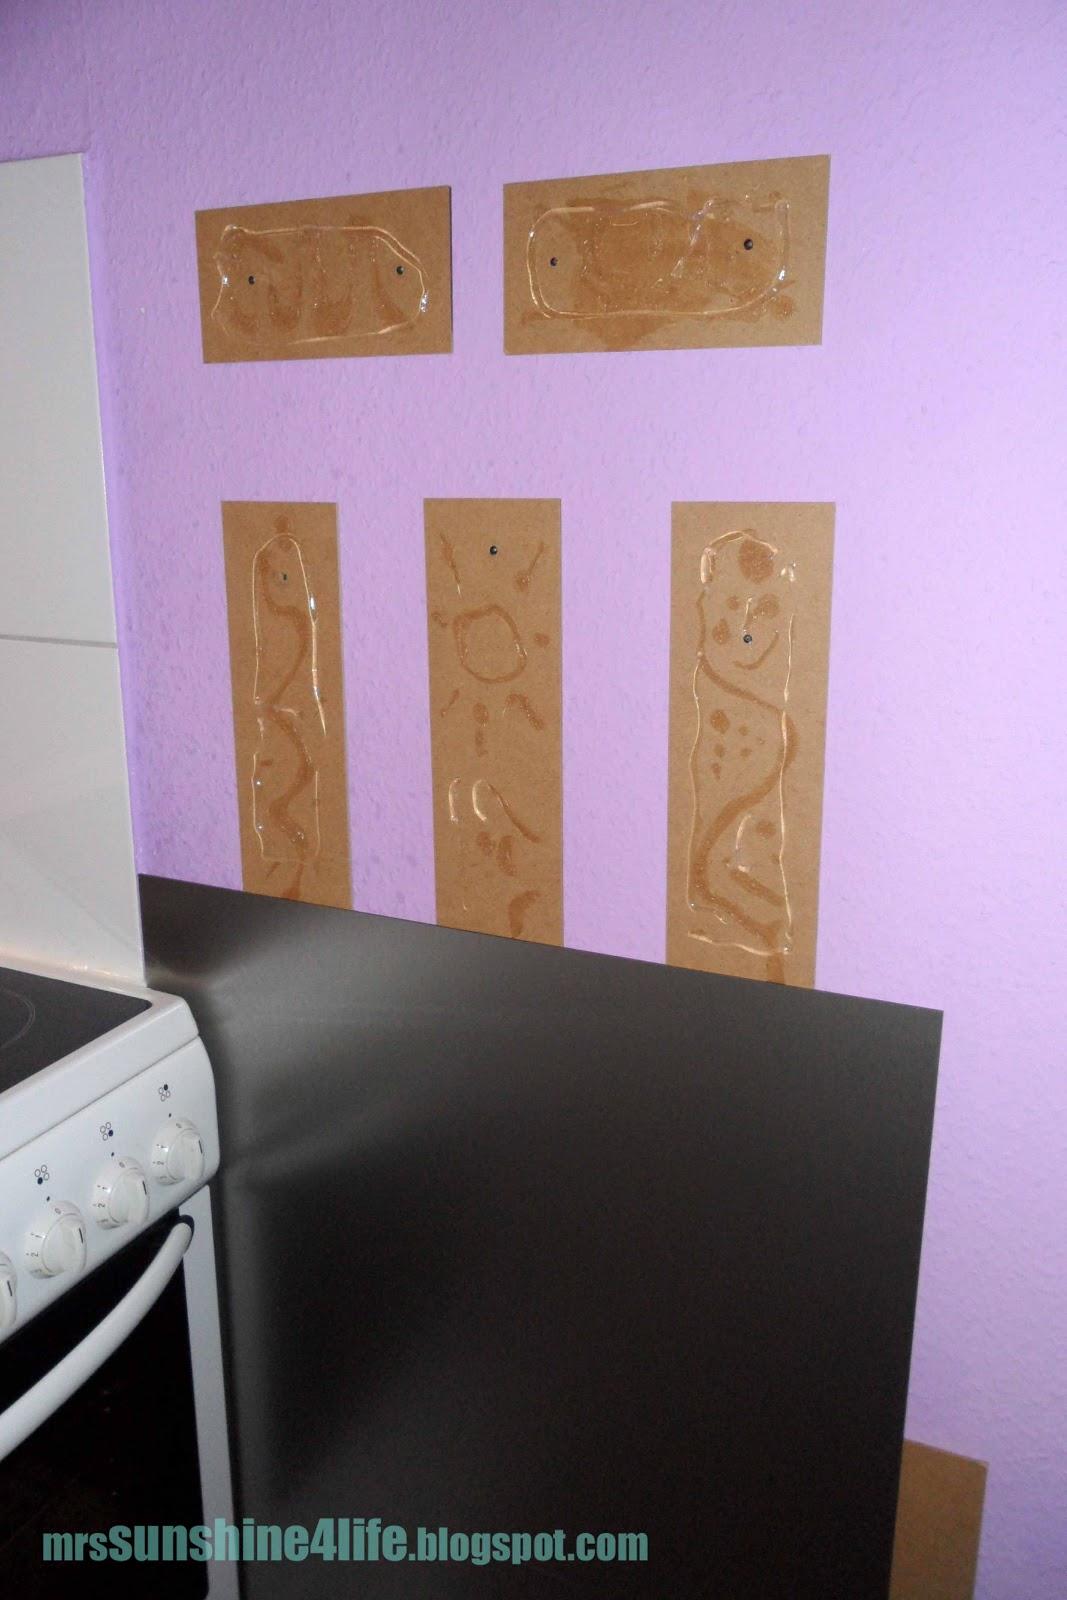 wandpaneele kuche ikea kche bei ikea kaufen awesome full size of teppich kuche ikea. Black Bedroom Furniture Sets. Home Design Ideas